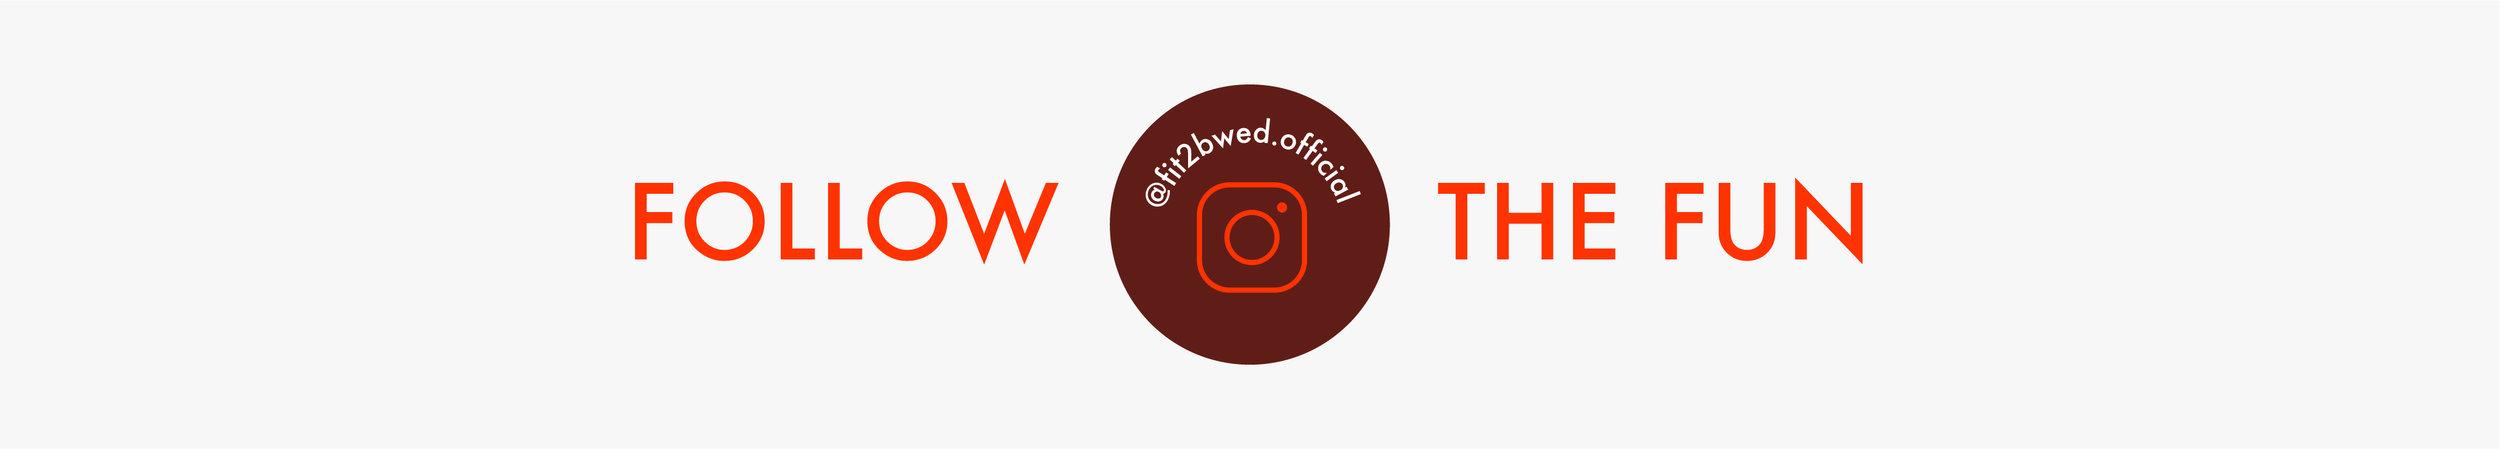 FollowBanner.jpg